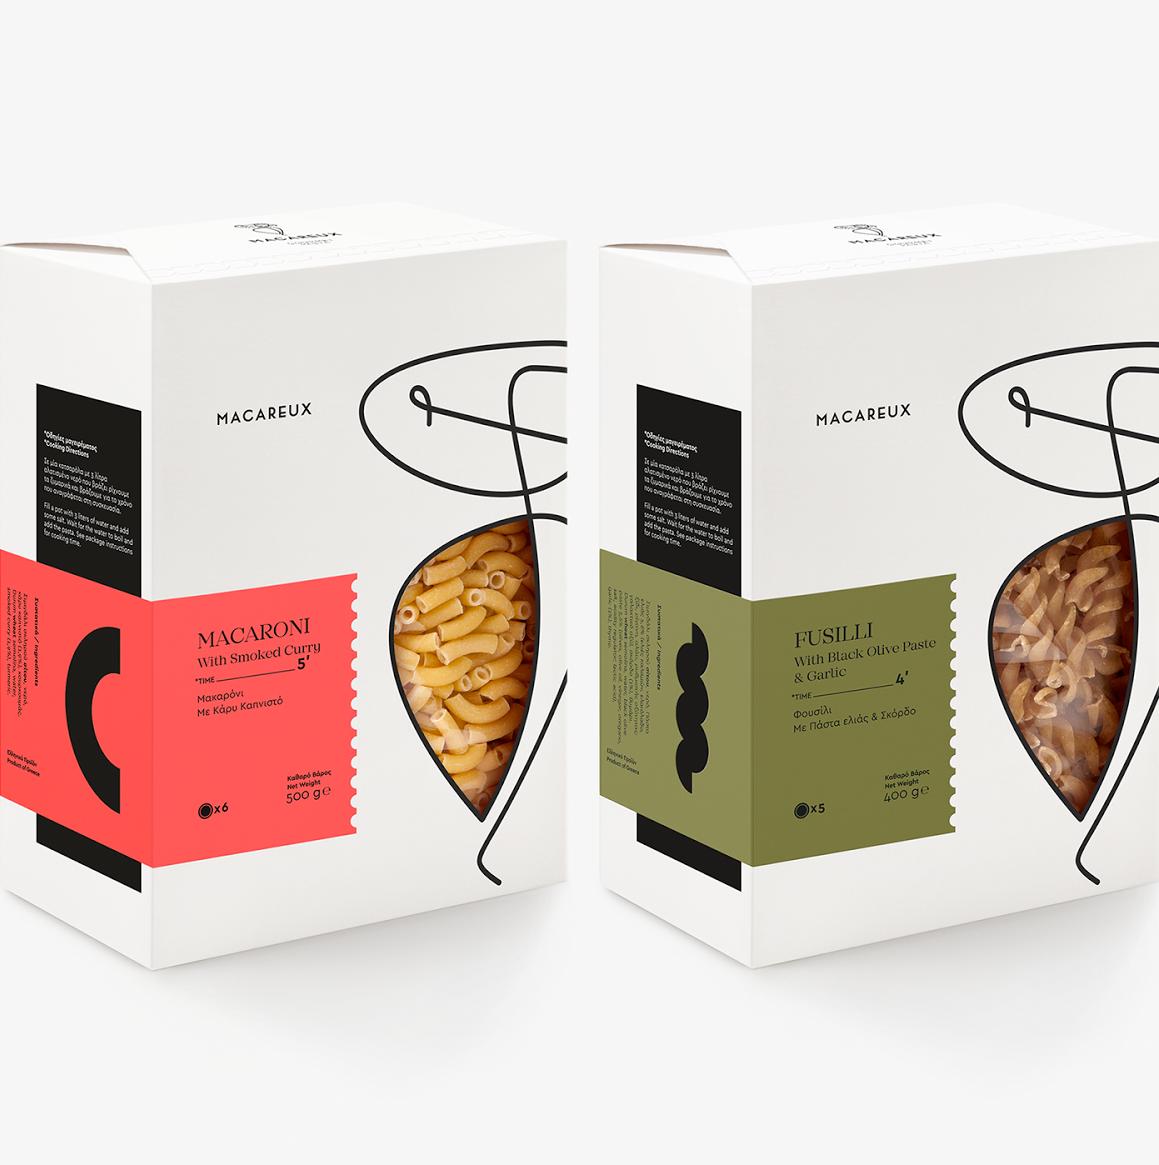 Luminous Design Group - Macareux #packaging #design #diseño #empaques #дизайна #упаковок #embalagens #emballage #worldpackagingdesign worldpackagingdesign.com